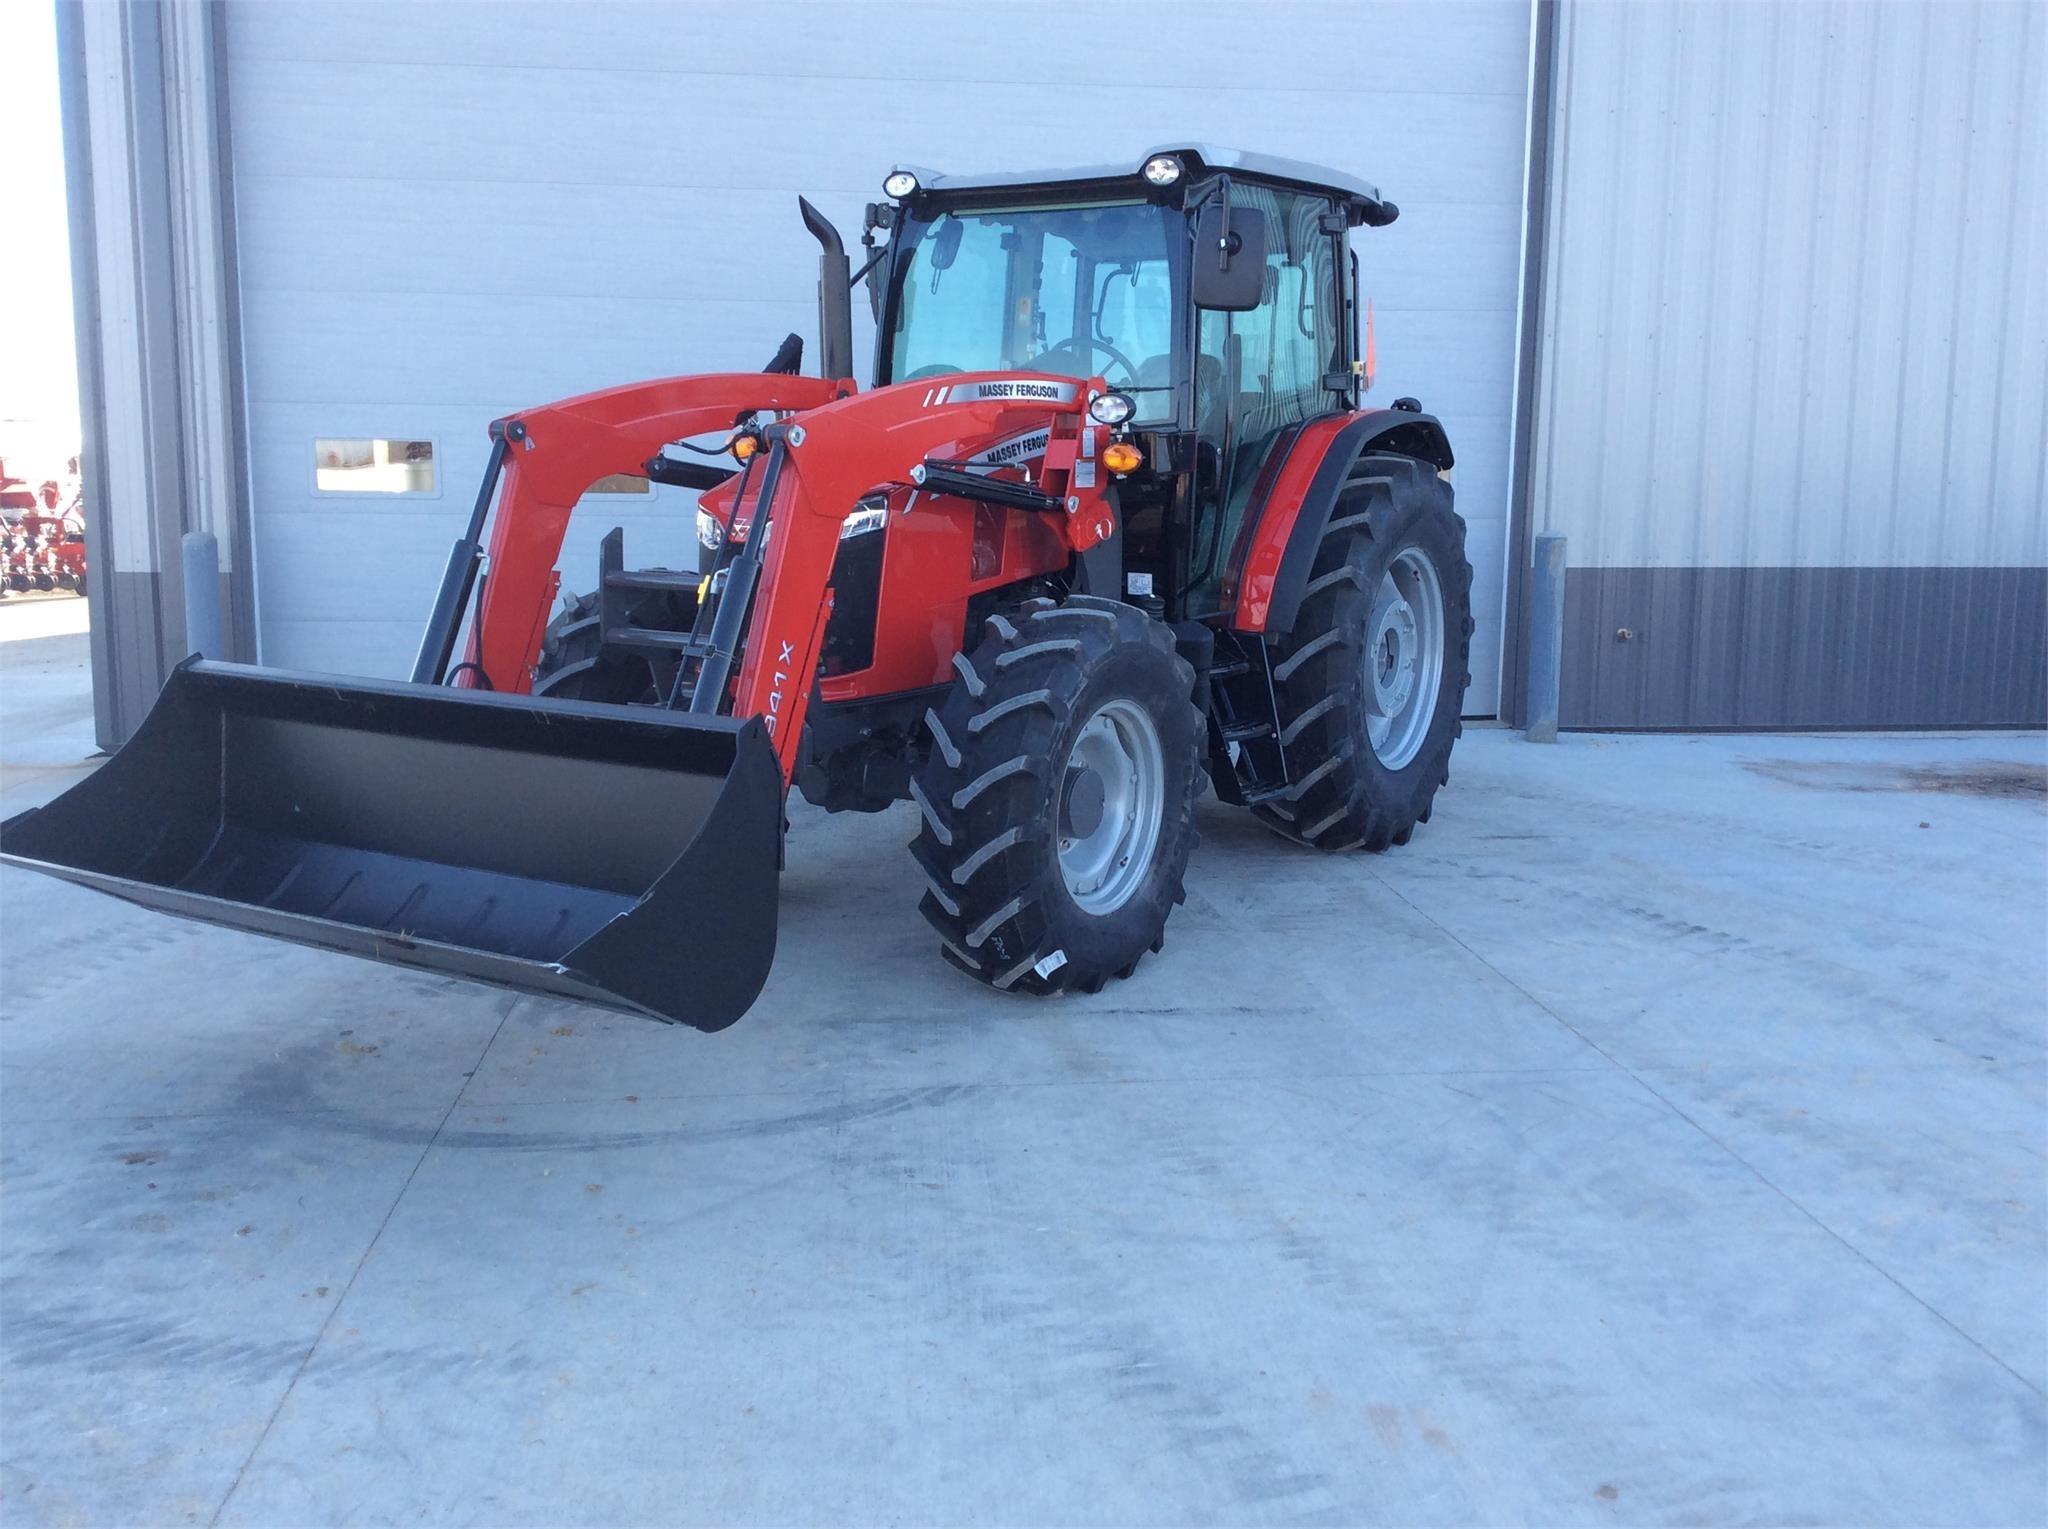 2019 Massey Ferguson 5710 Tractor